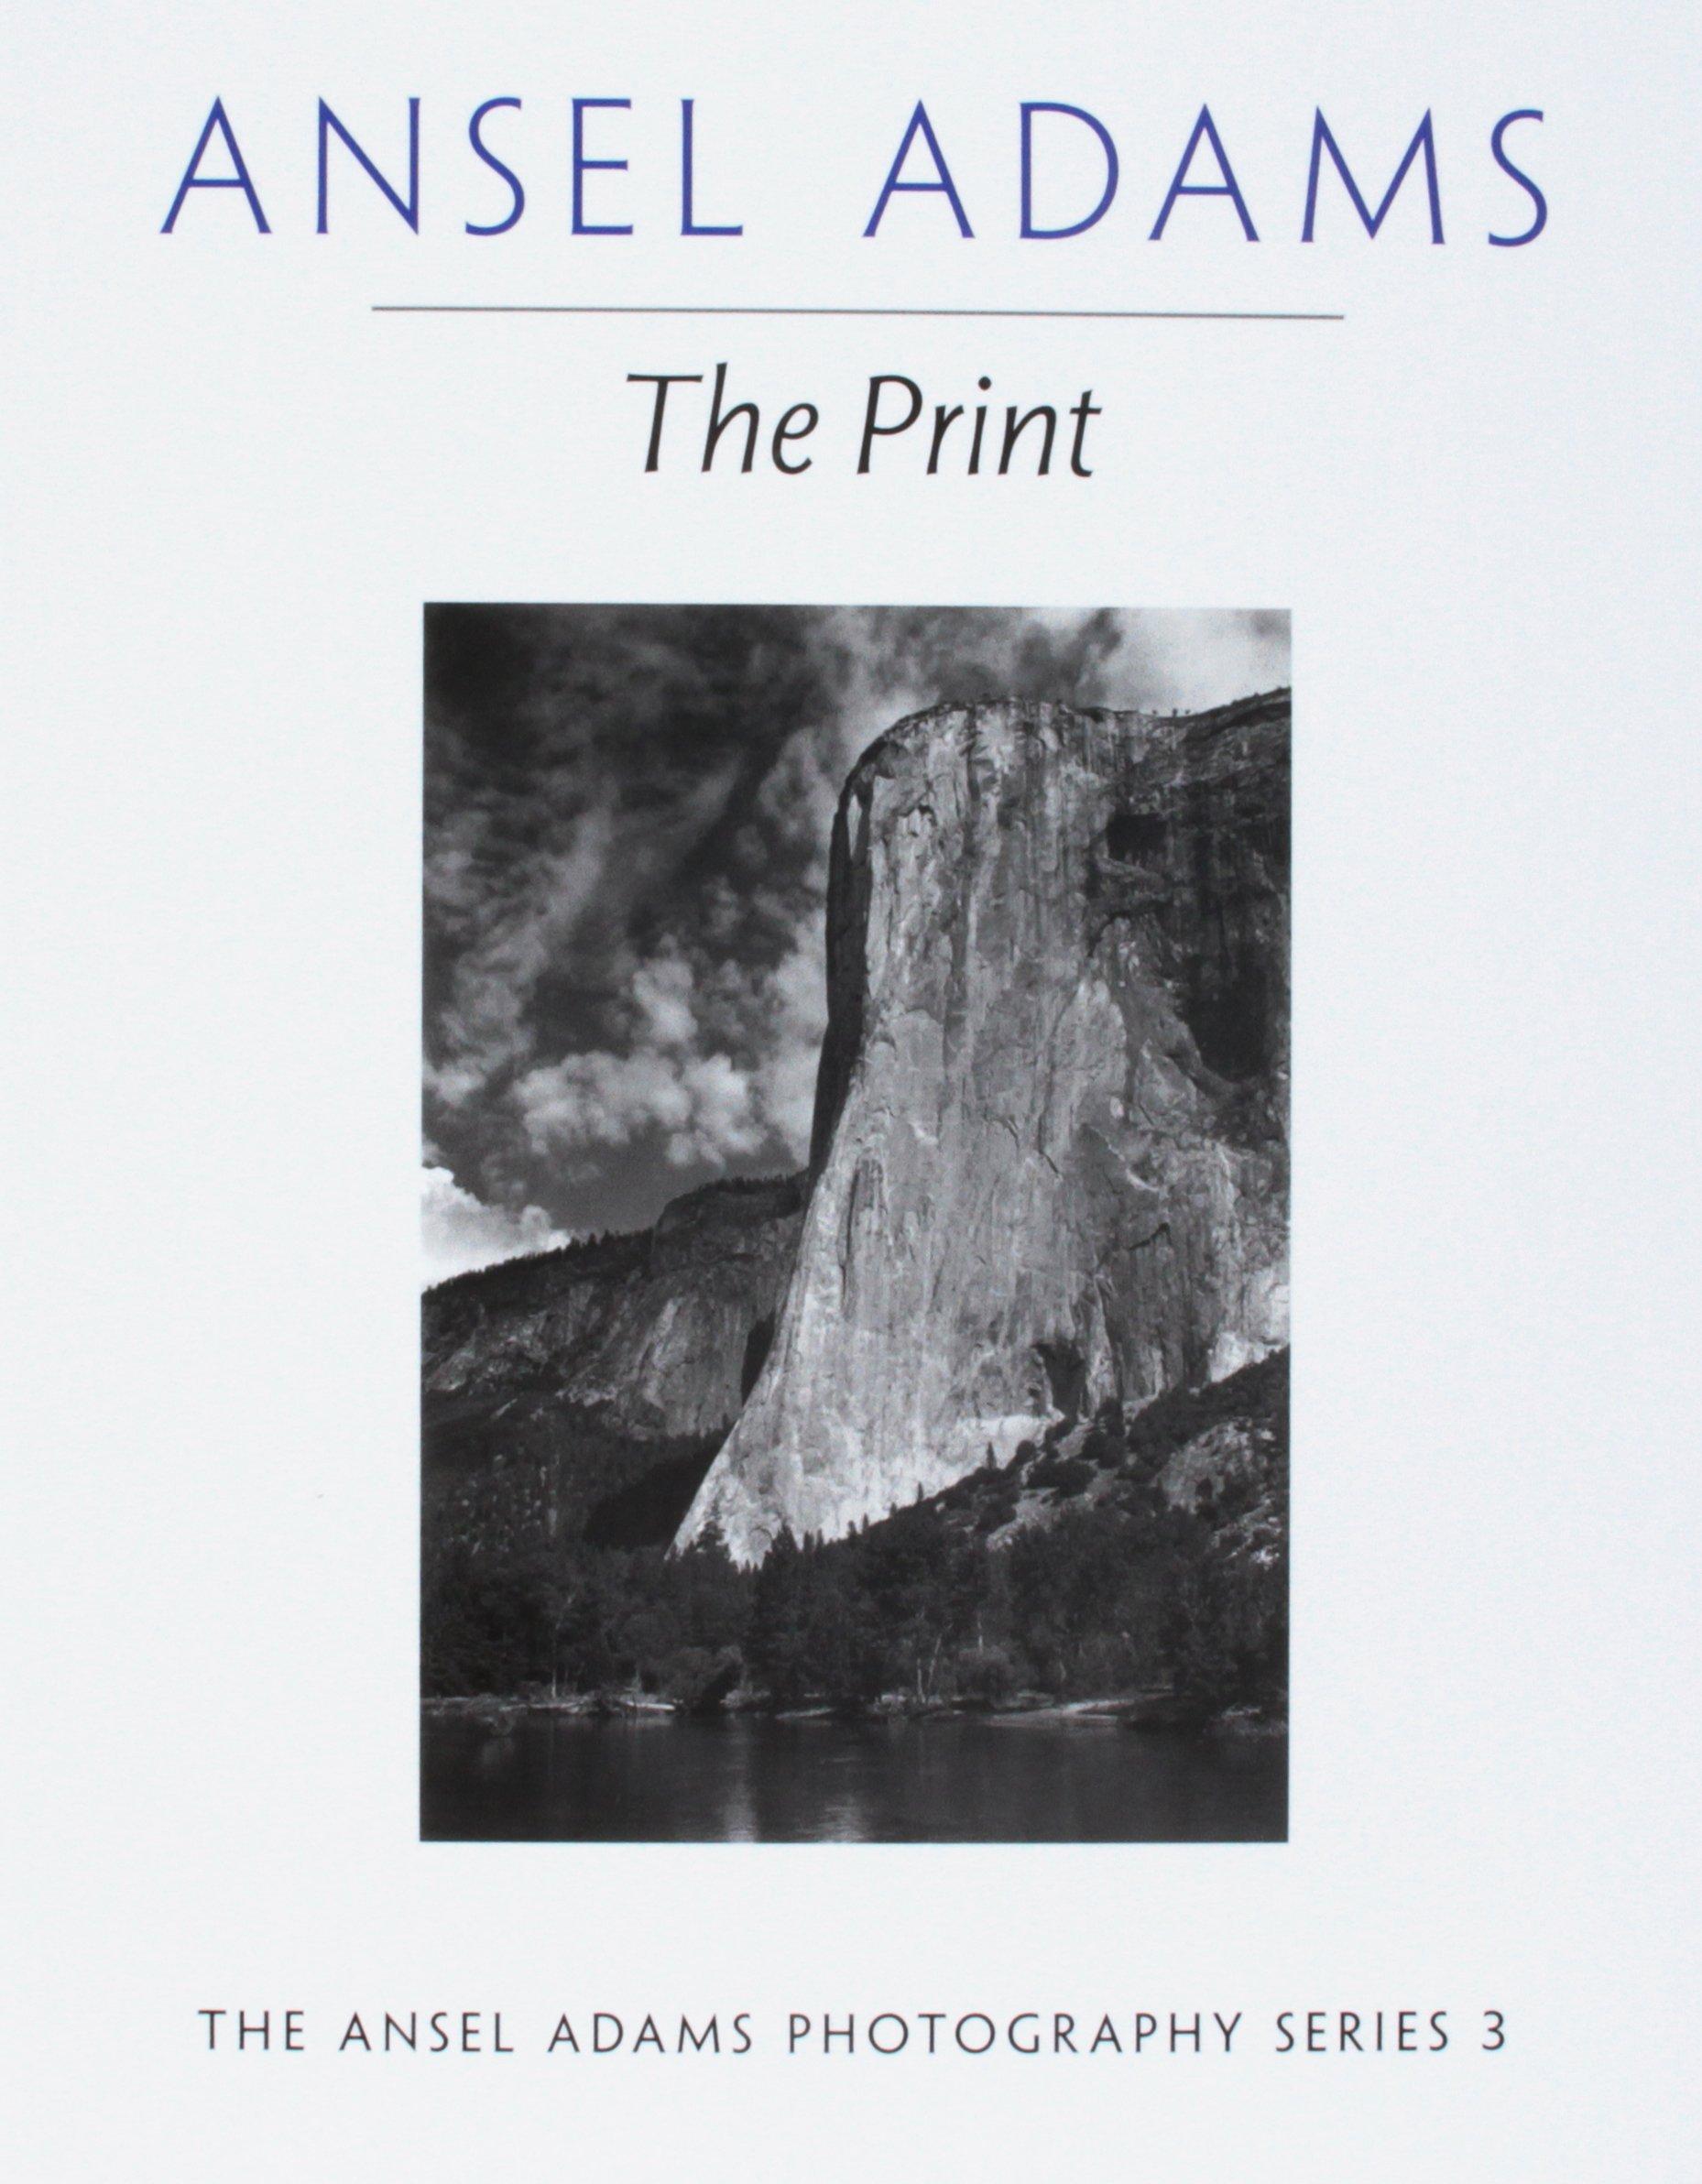 Ansel Adams - The Print   Spencer Lum